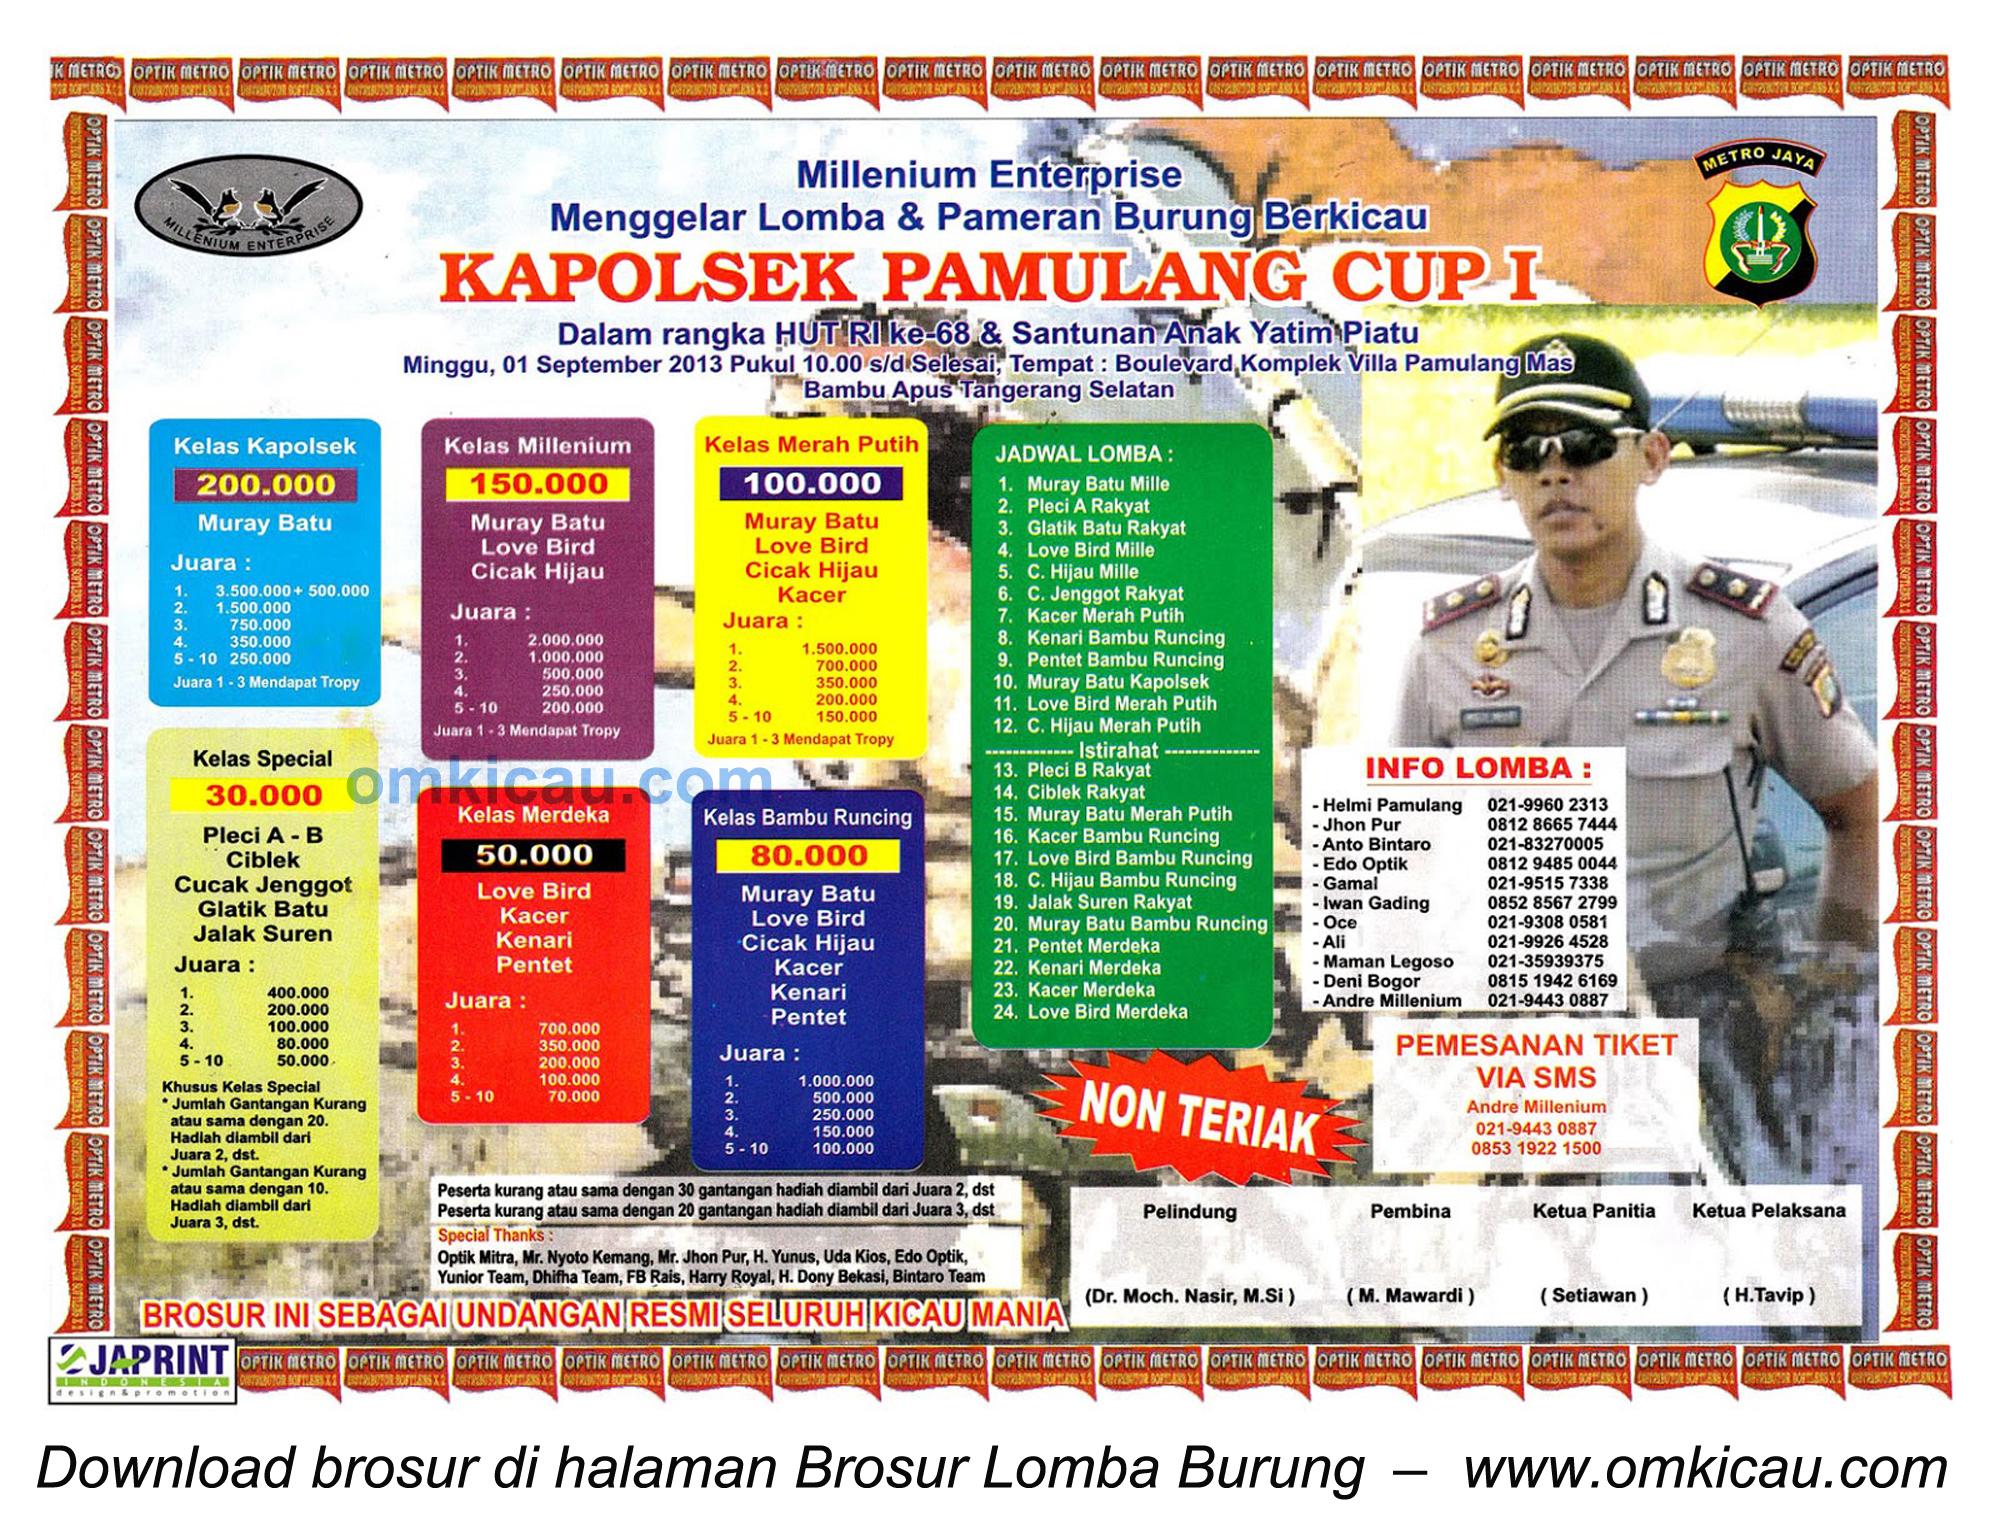 Brosur Lomba Burung Kapolsek Pamulang Cup I, Tangsel, 1 Sept 2013